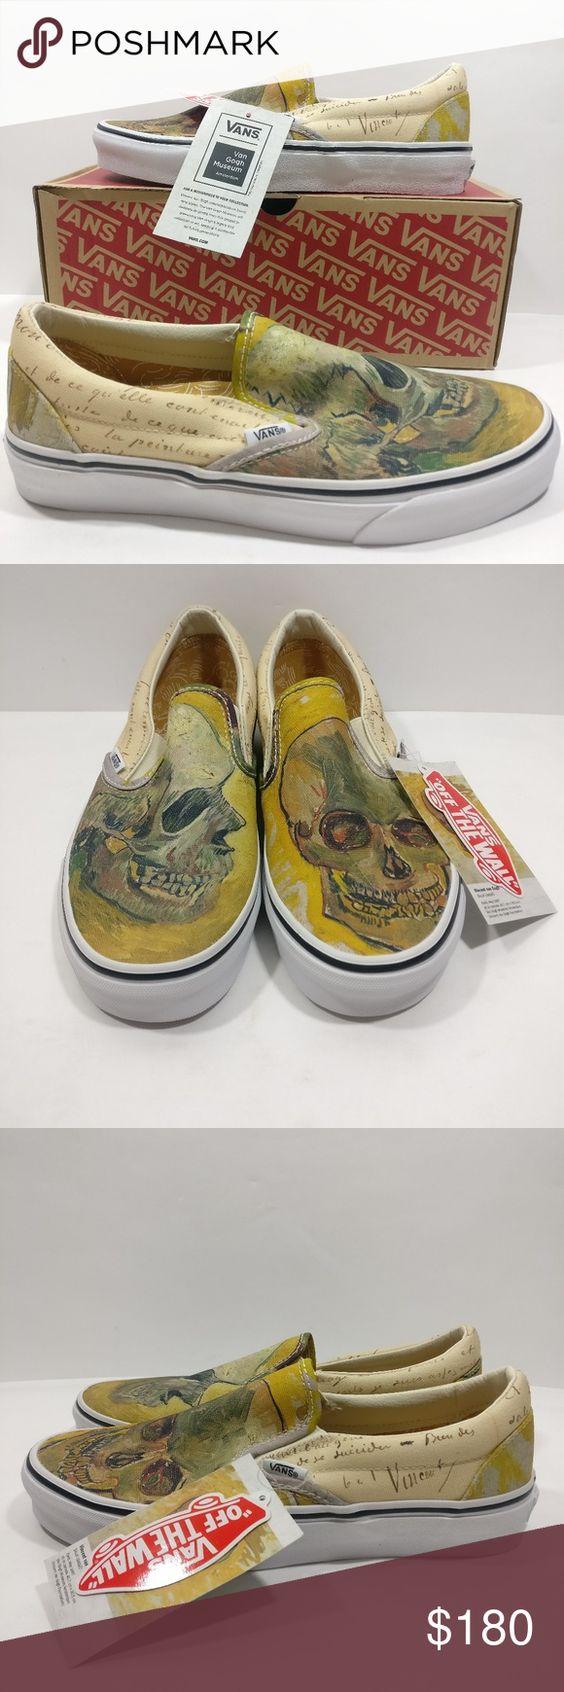 Vans Vincent Van Gogh Skull Slip On Shoes Vans Slip On Shoes On Shoes